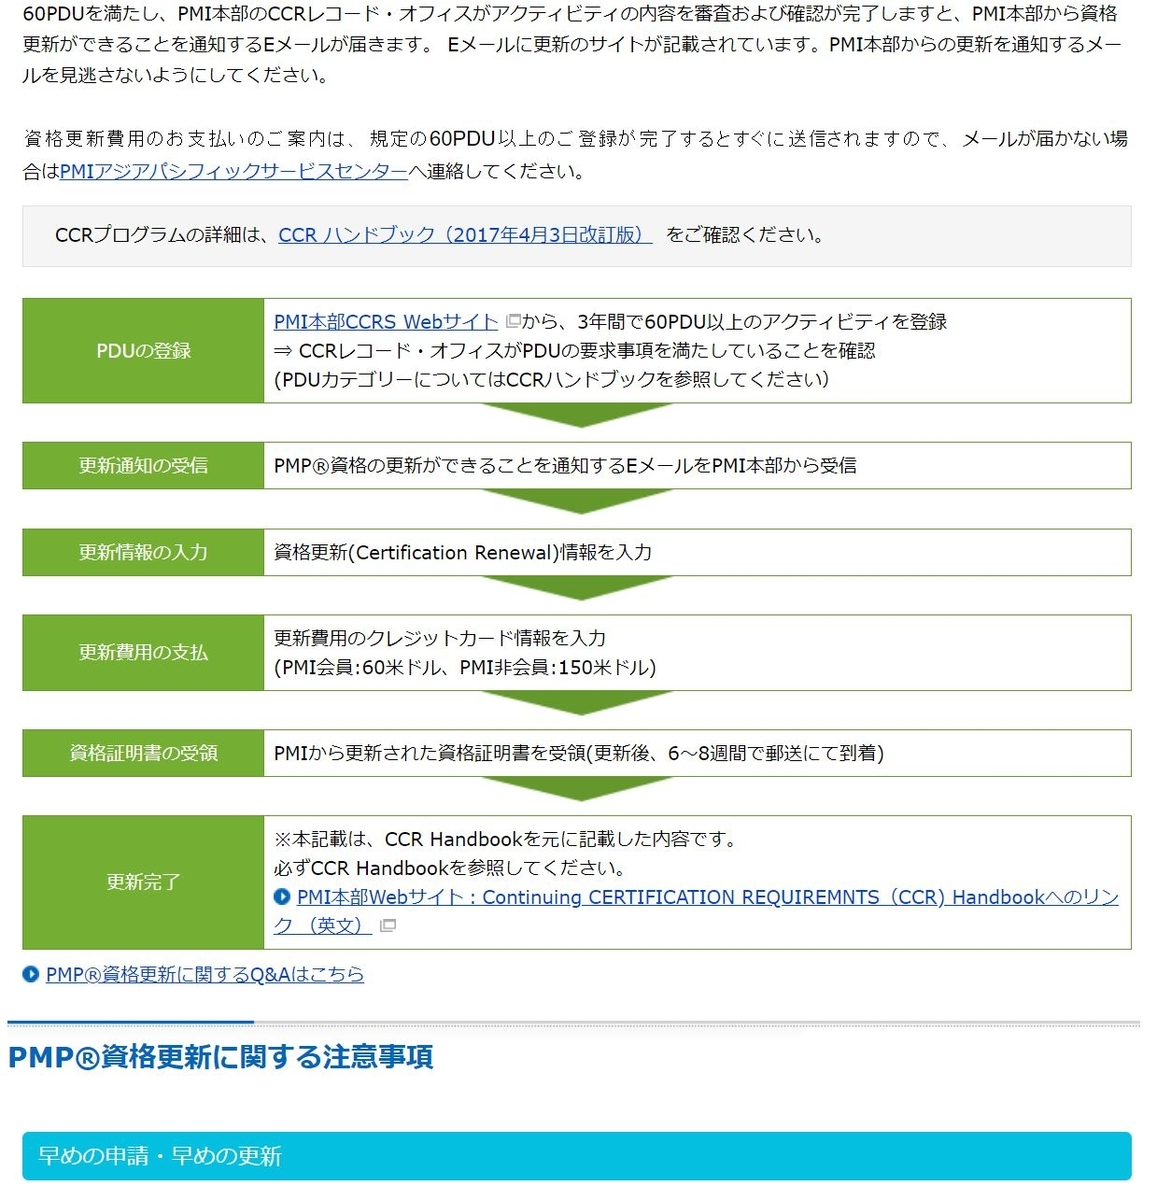 PMP試験対策ブログ PDU申請 PMPの更新